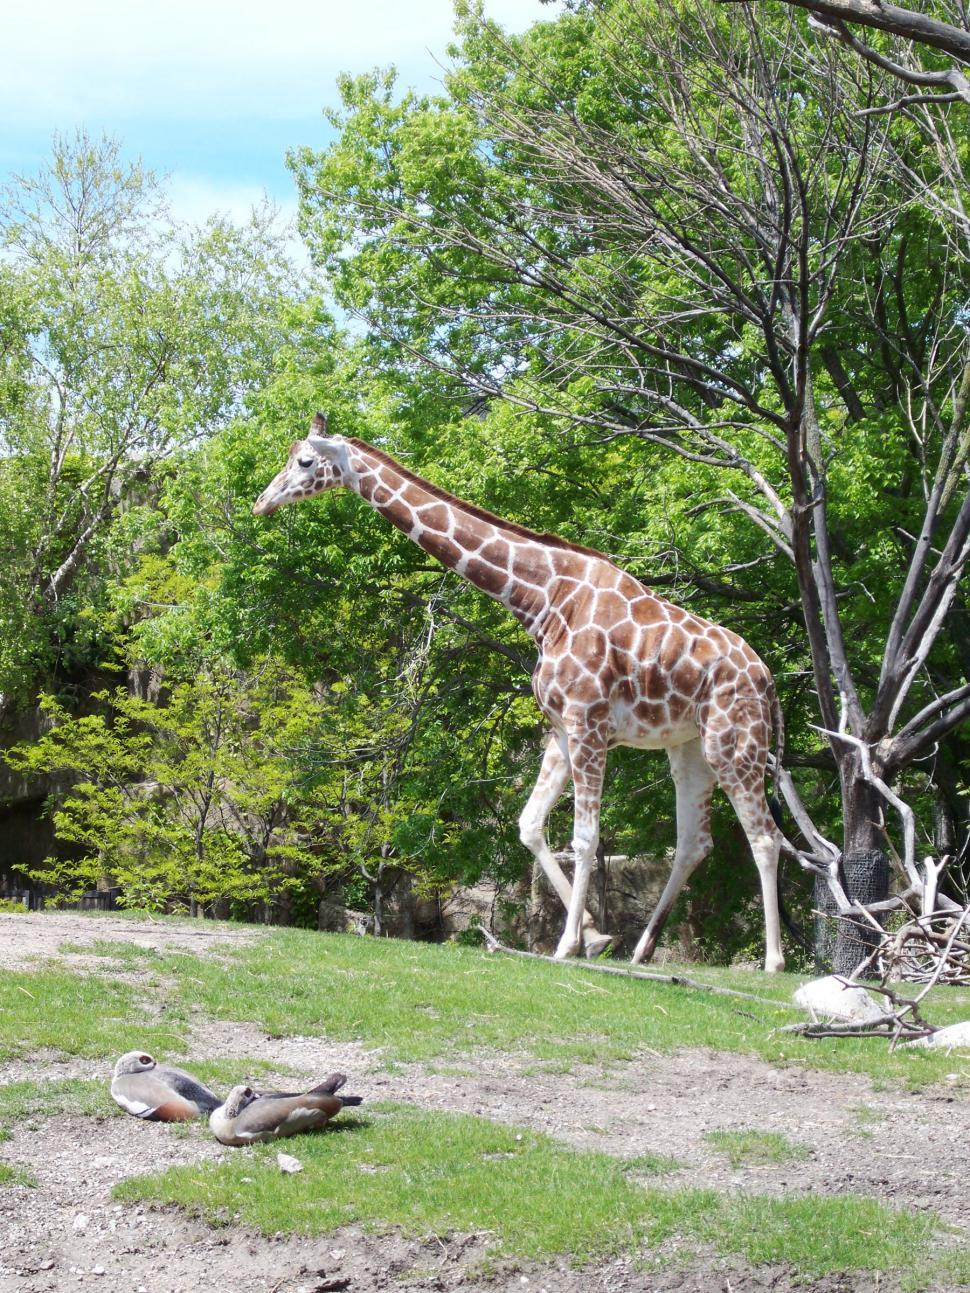 Download Free Stock Photo of Giraffe